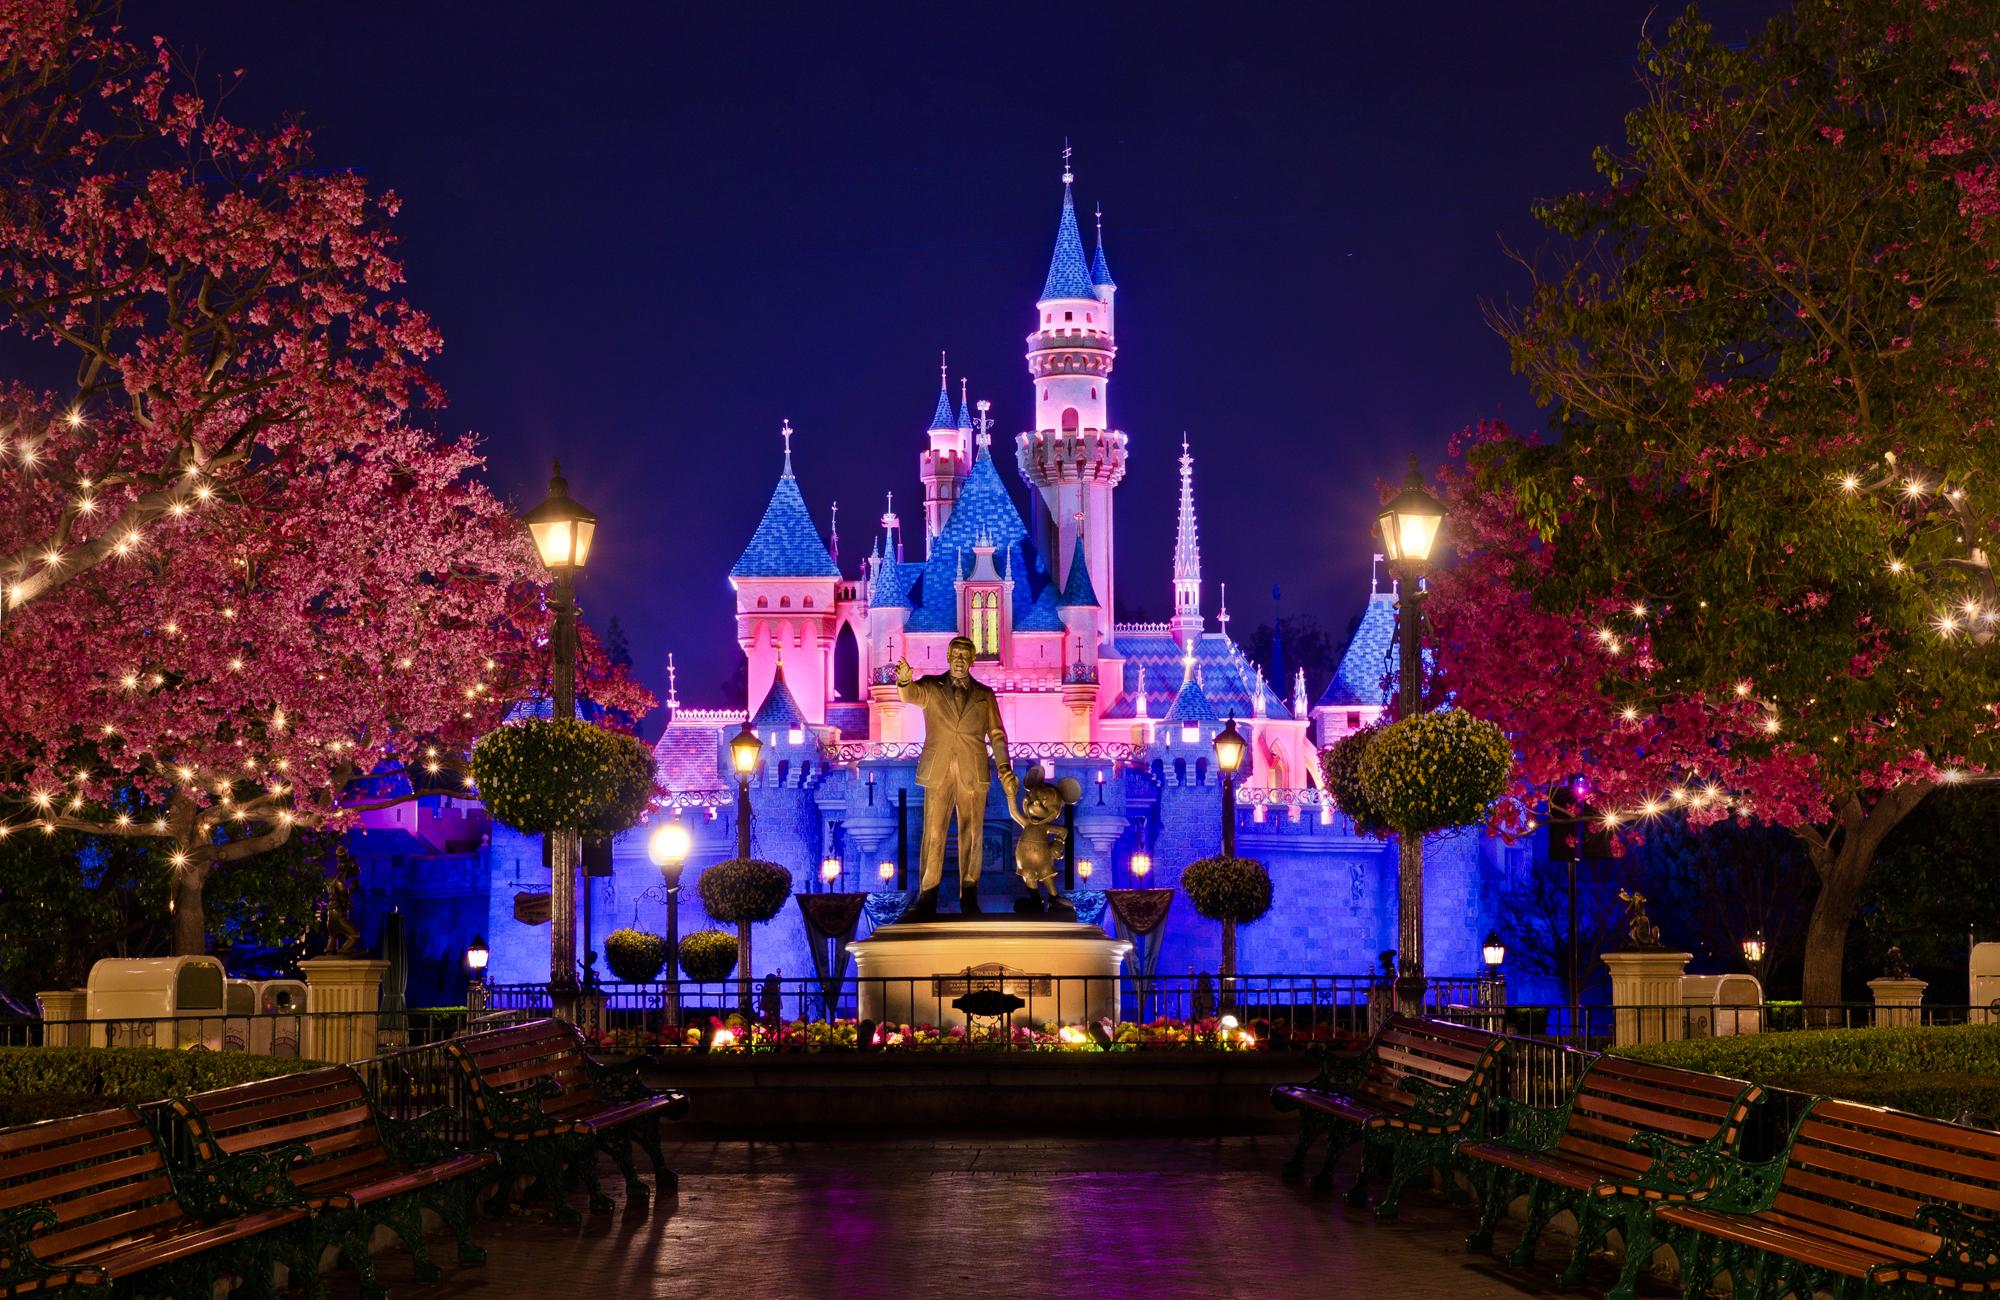 Disney-Castle-High-Resolution-Wallpaper.